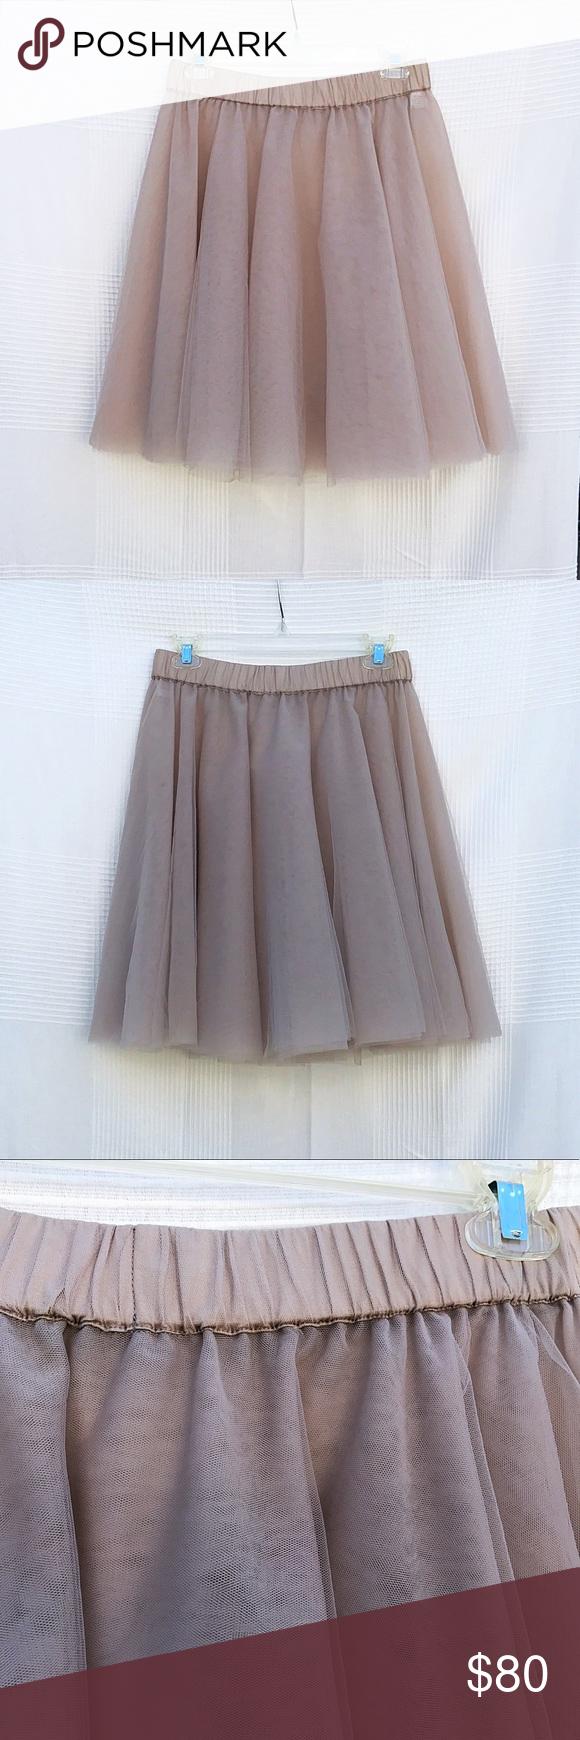 4f49afeb42 ✨💕SALE💕Cathrine Hammel CLASSIC TULLE SKIRT-Taupe Cathrine Hammel CLASSIC  TULLE SKIRT- Taupe Classic tulle skirt with multiple tulle layers, cotton  lining ...